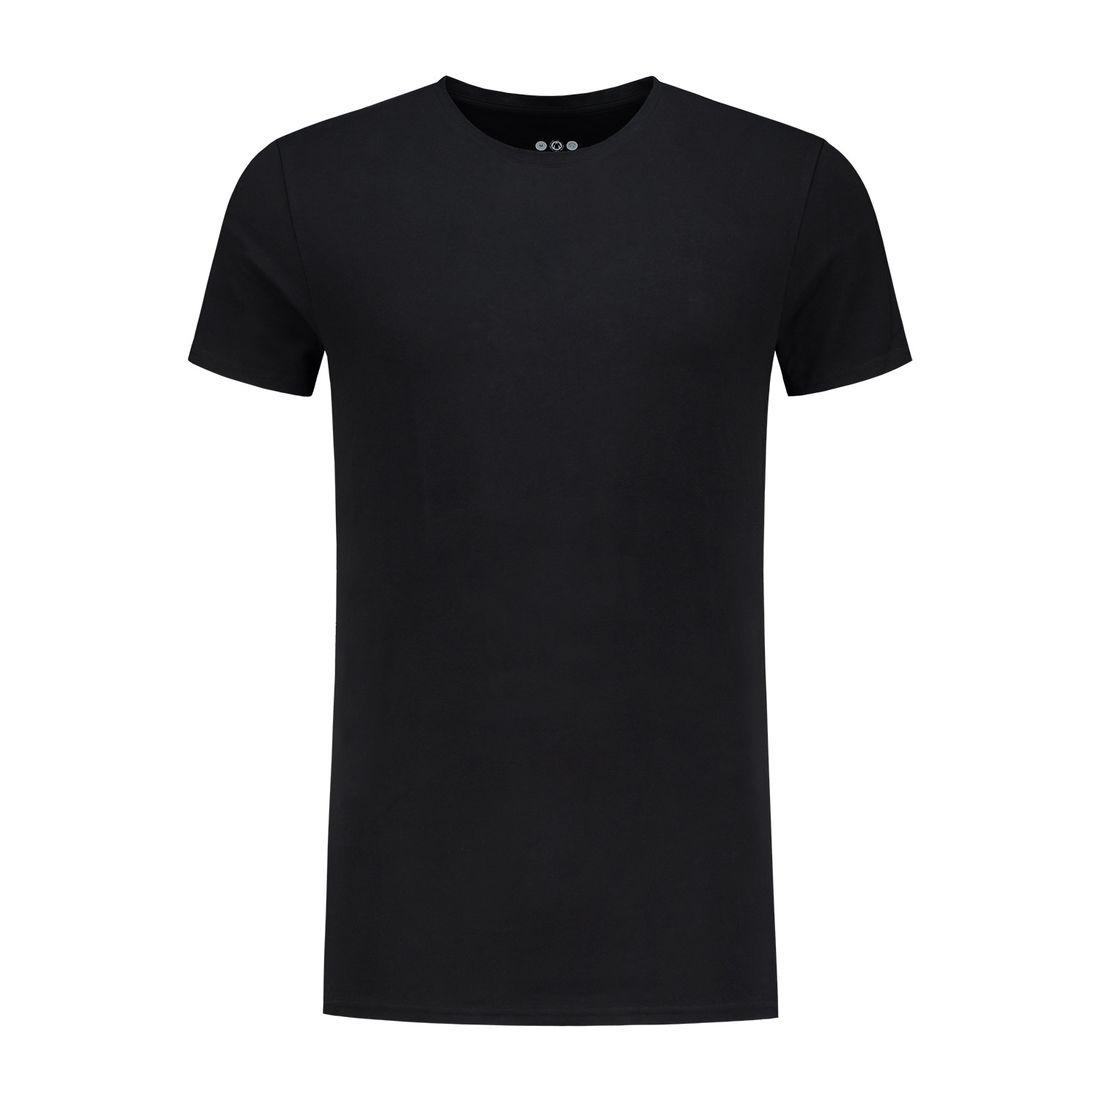 Afbeelding van A dam Underwear otis O hals shirt long zwart heren